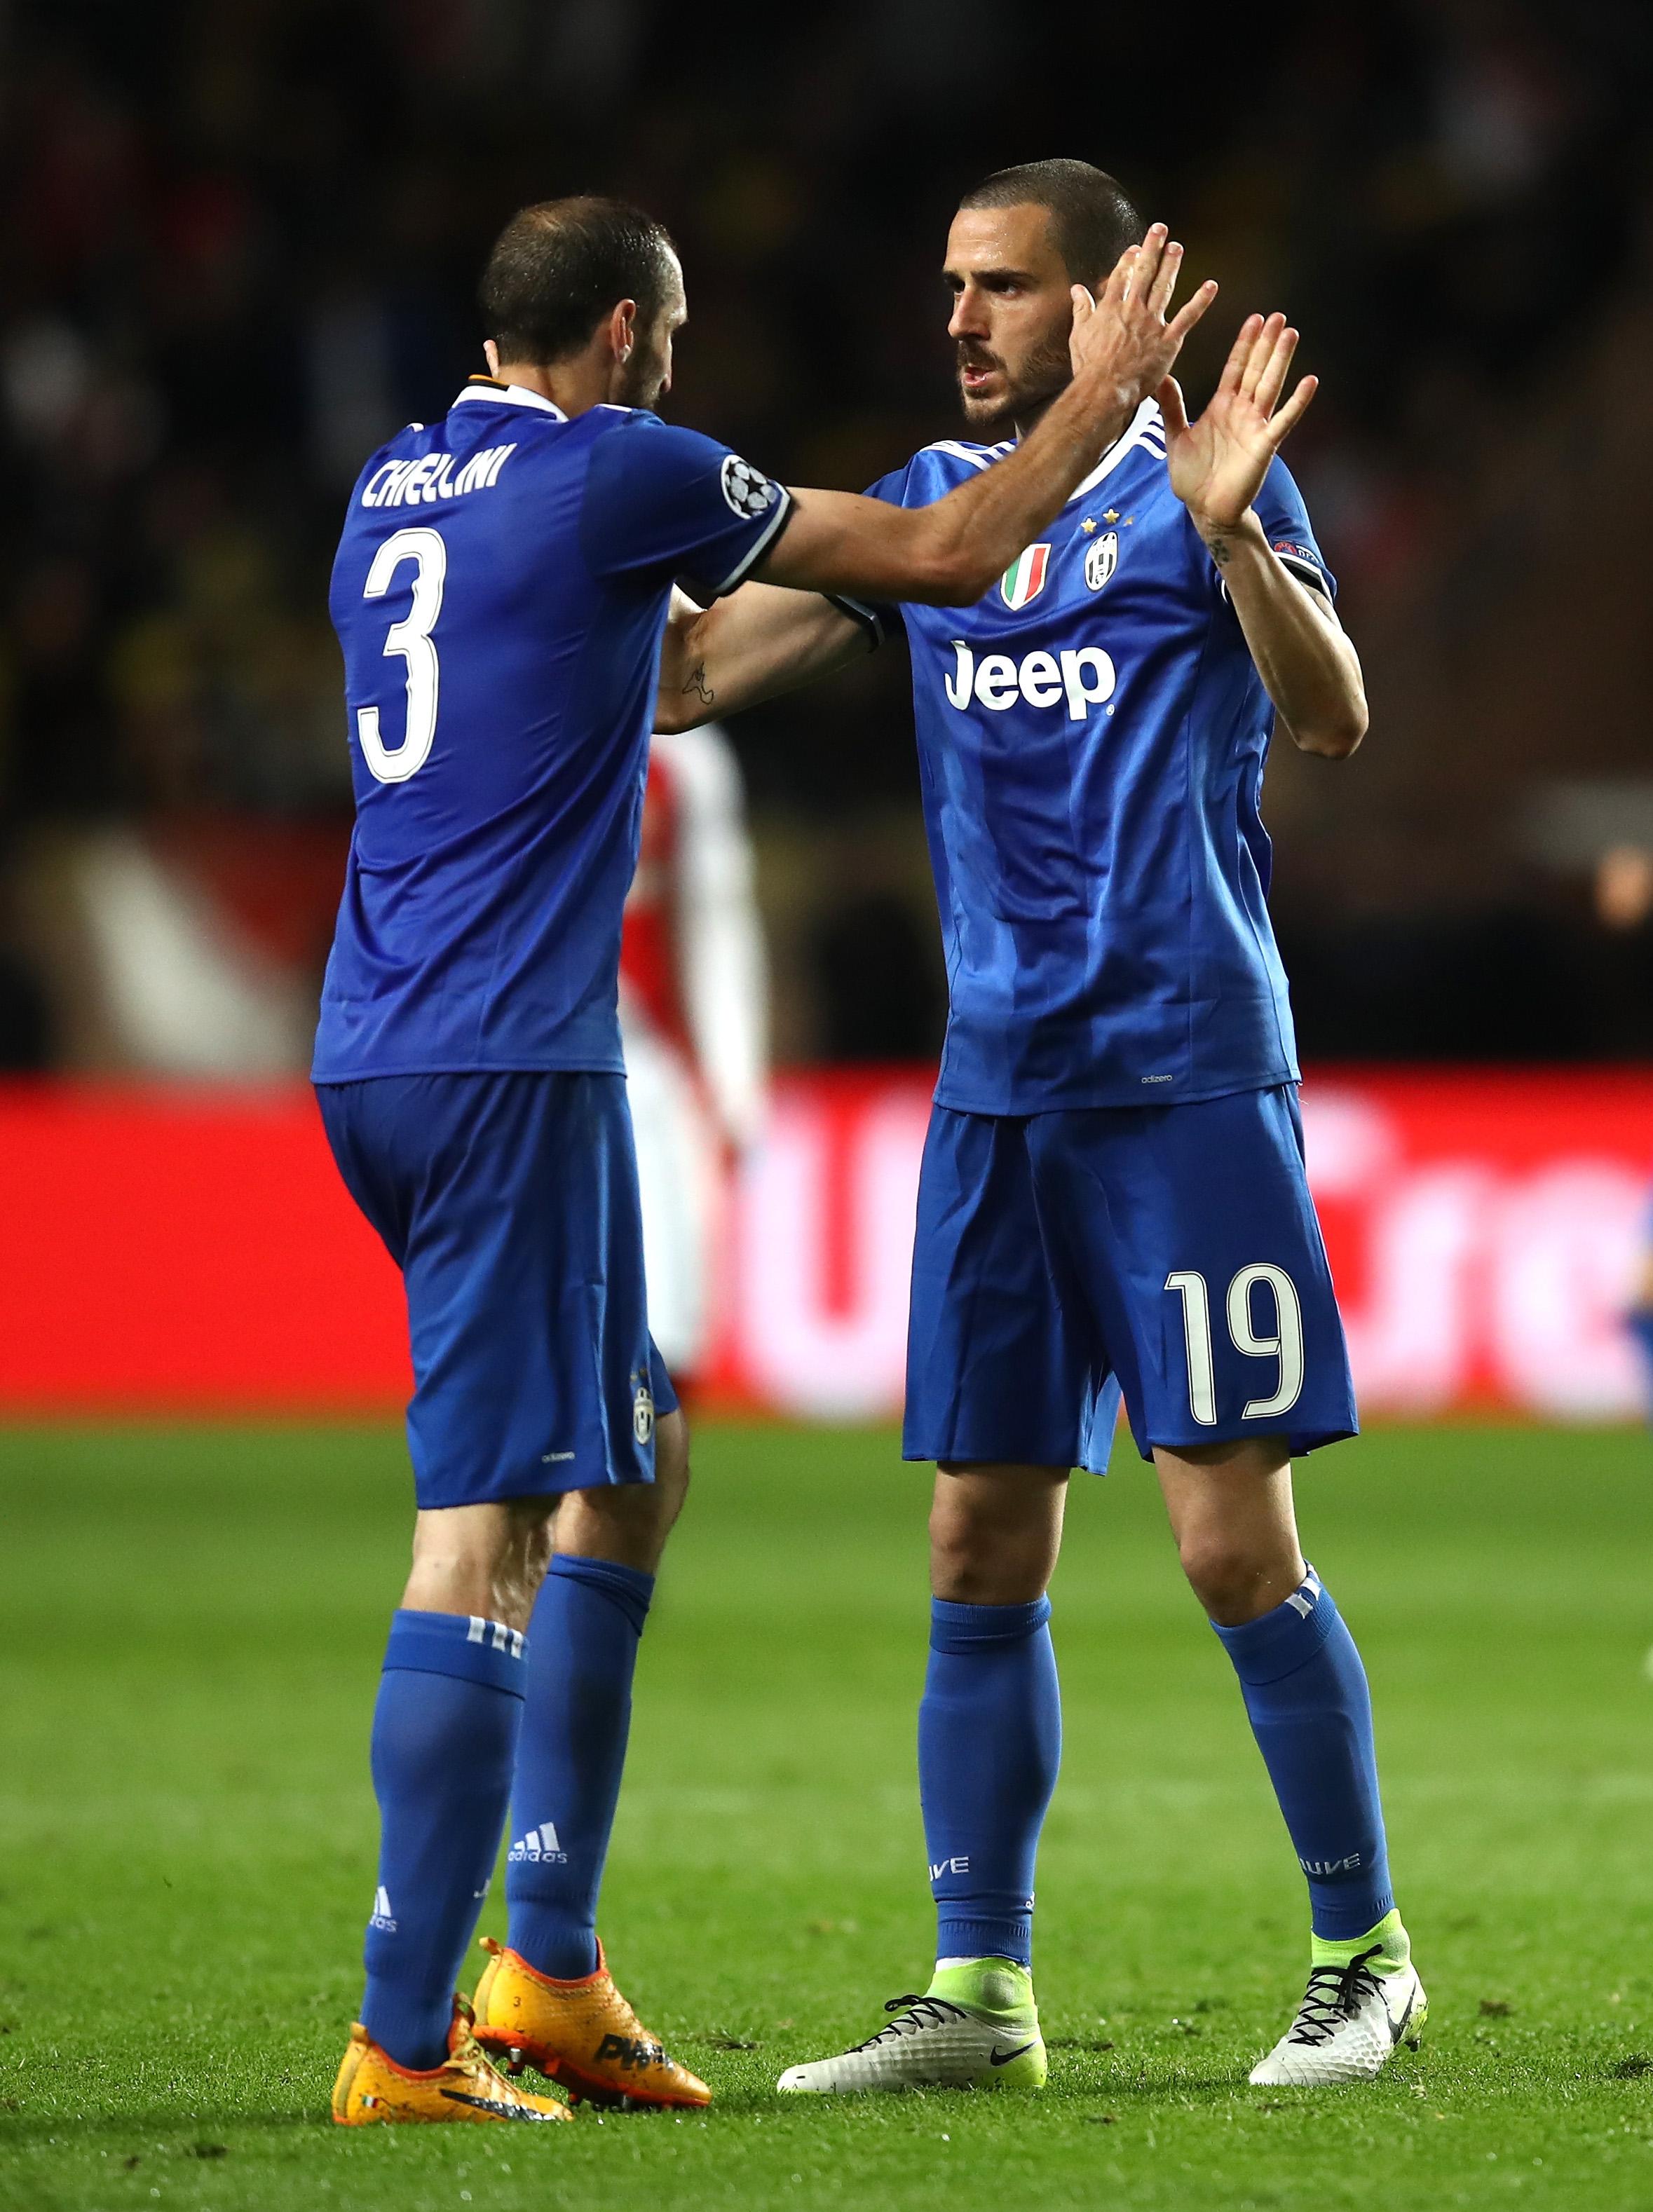 AS Monaco v Juventus - UEFA Champions League Semi Final: First Leg